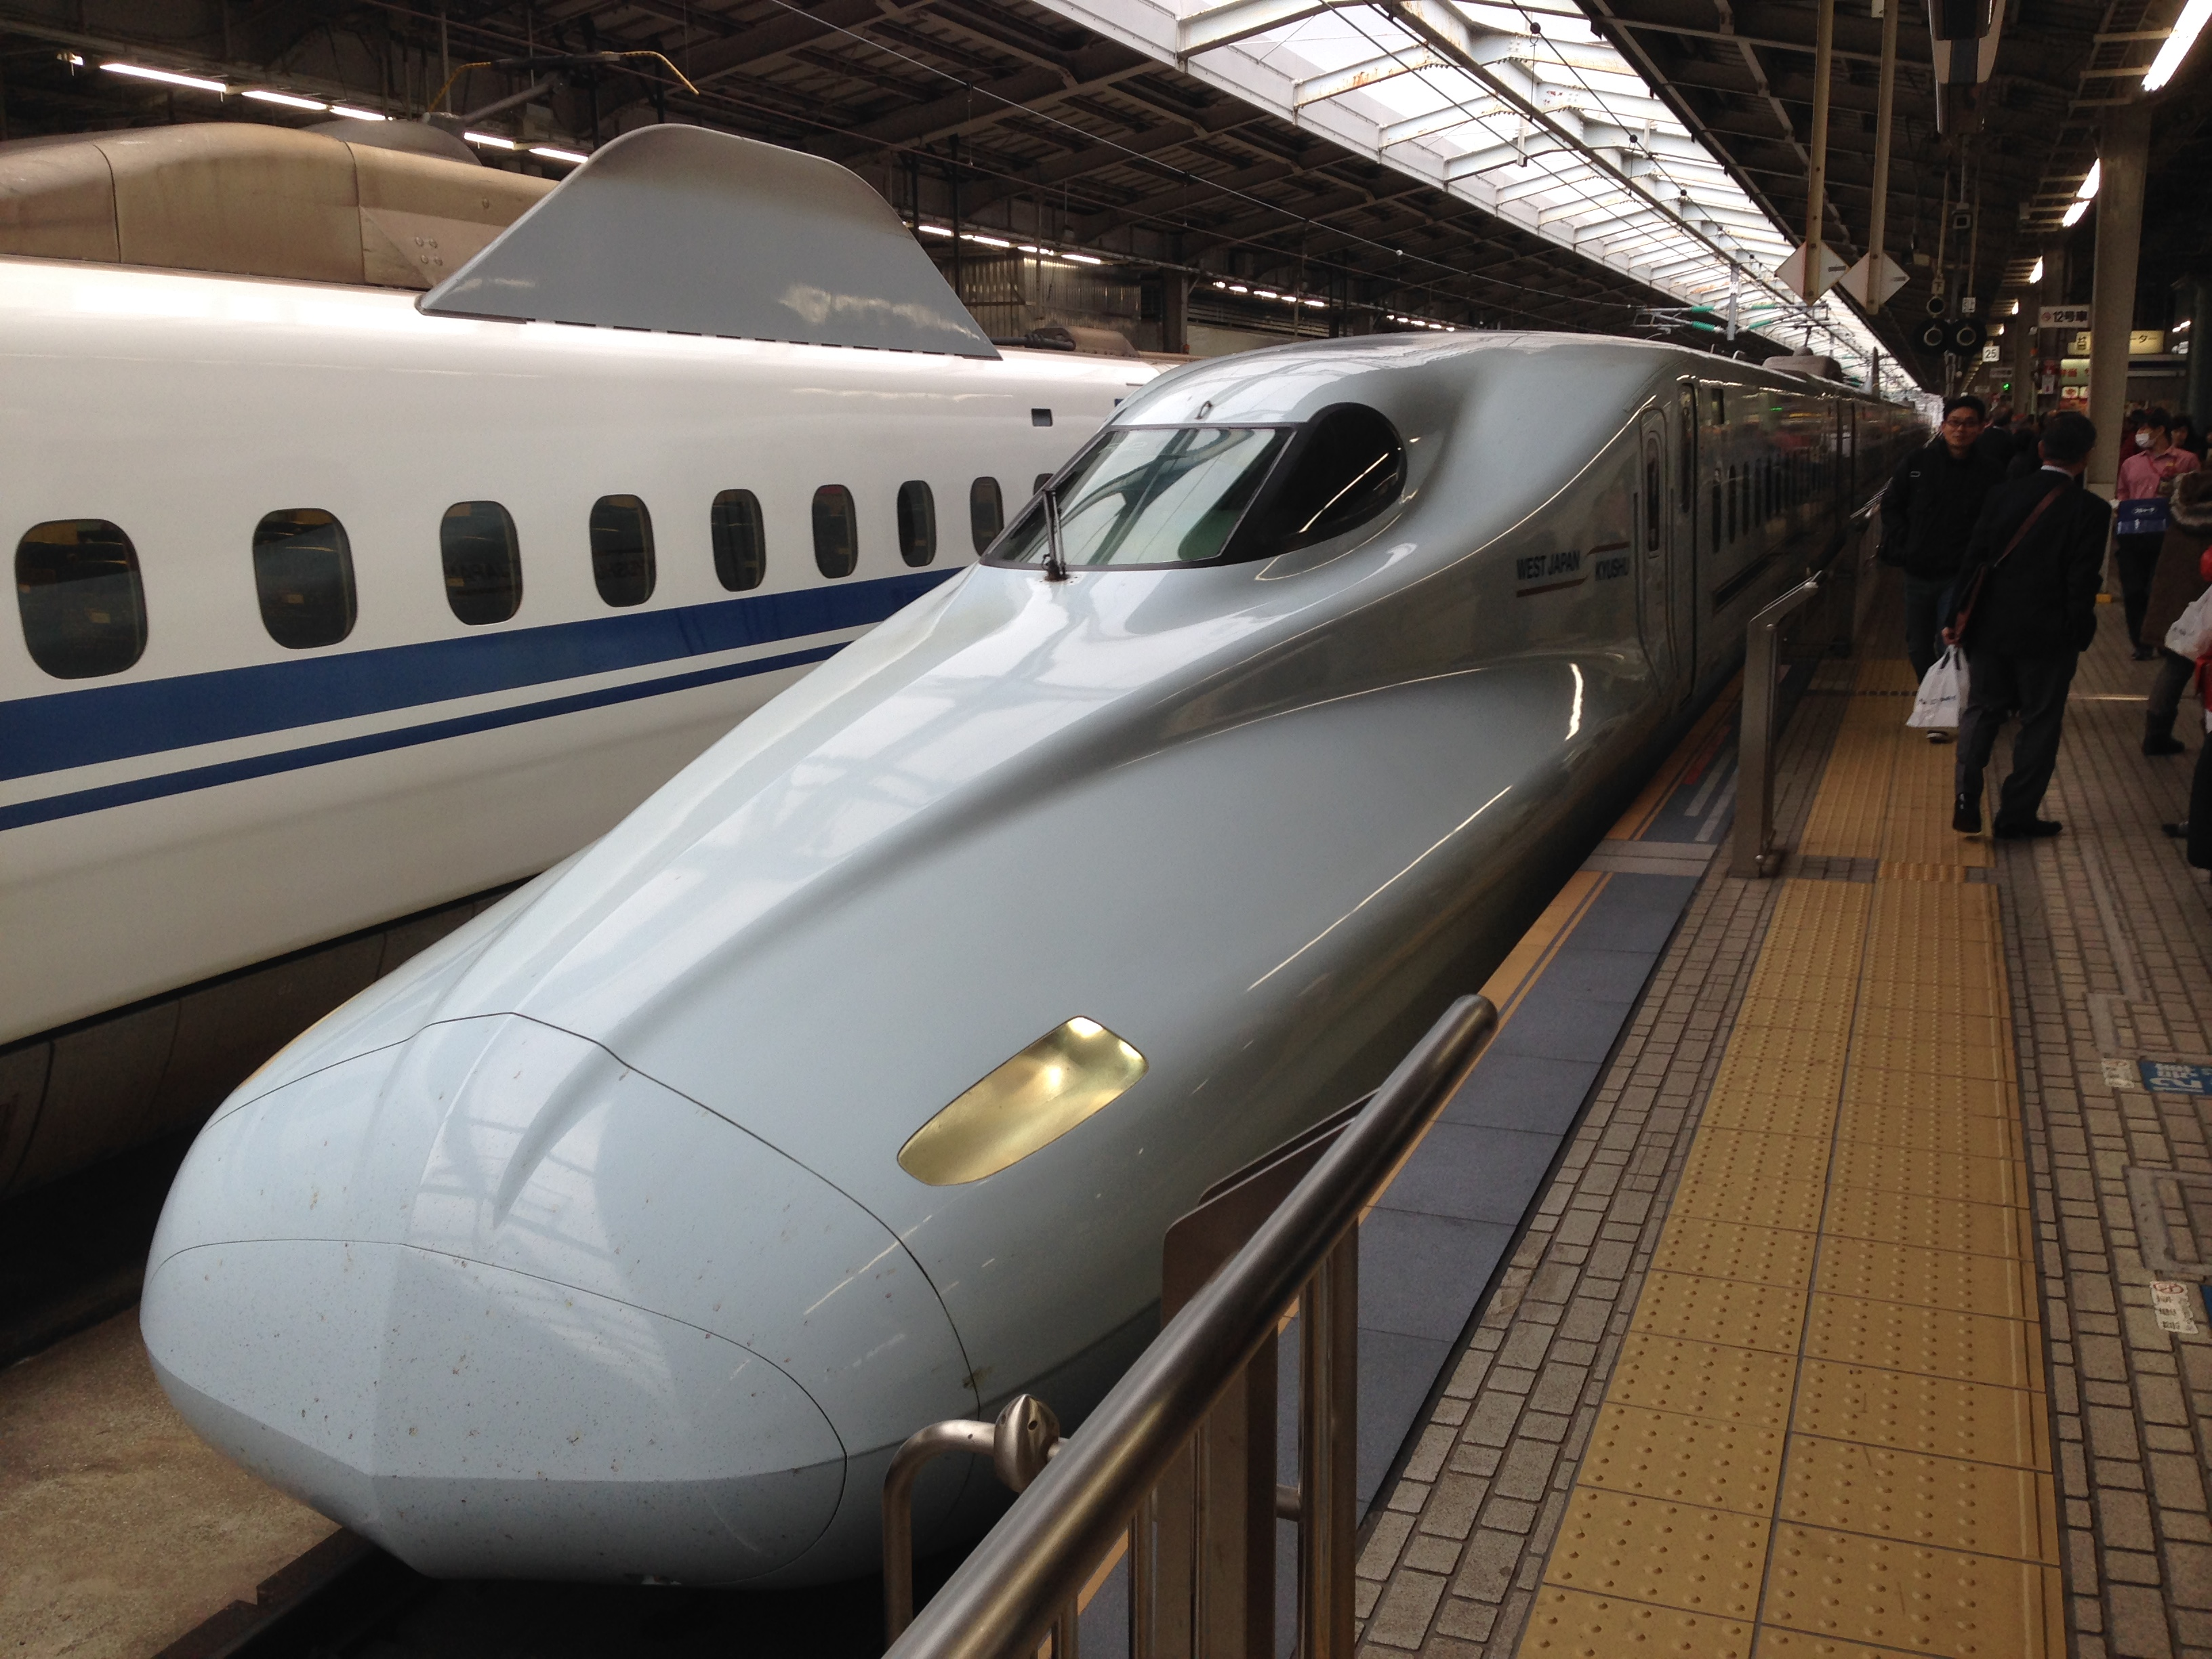 Shinkansen The Japanese Bullet Train Using The Japan